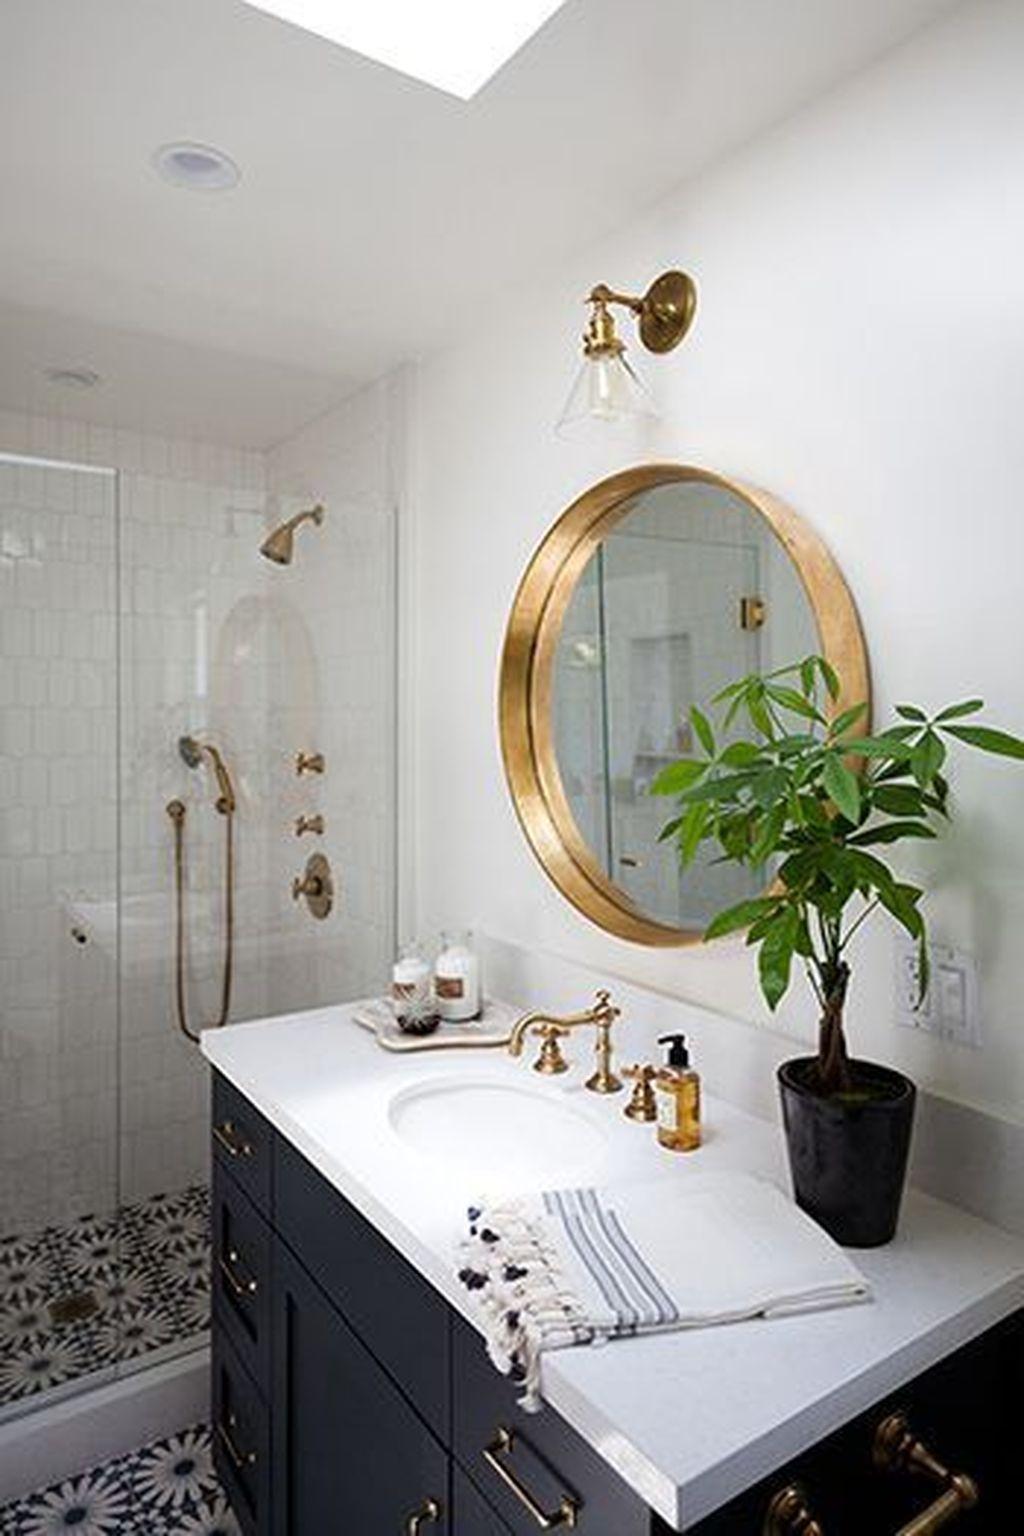 46 Popular Bathroom Mirror Design Ideas For Any Bathroom Model With Images Elegant Bathroom Retro Bathrooms Bathroom Mirror Design